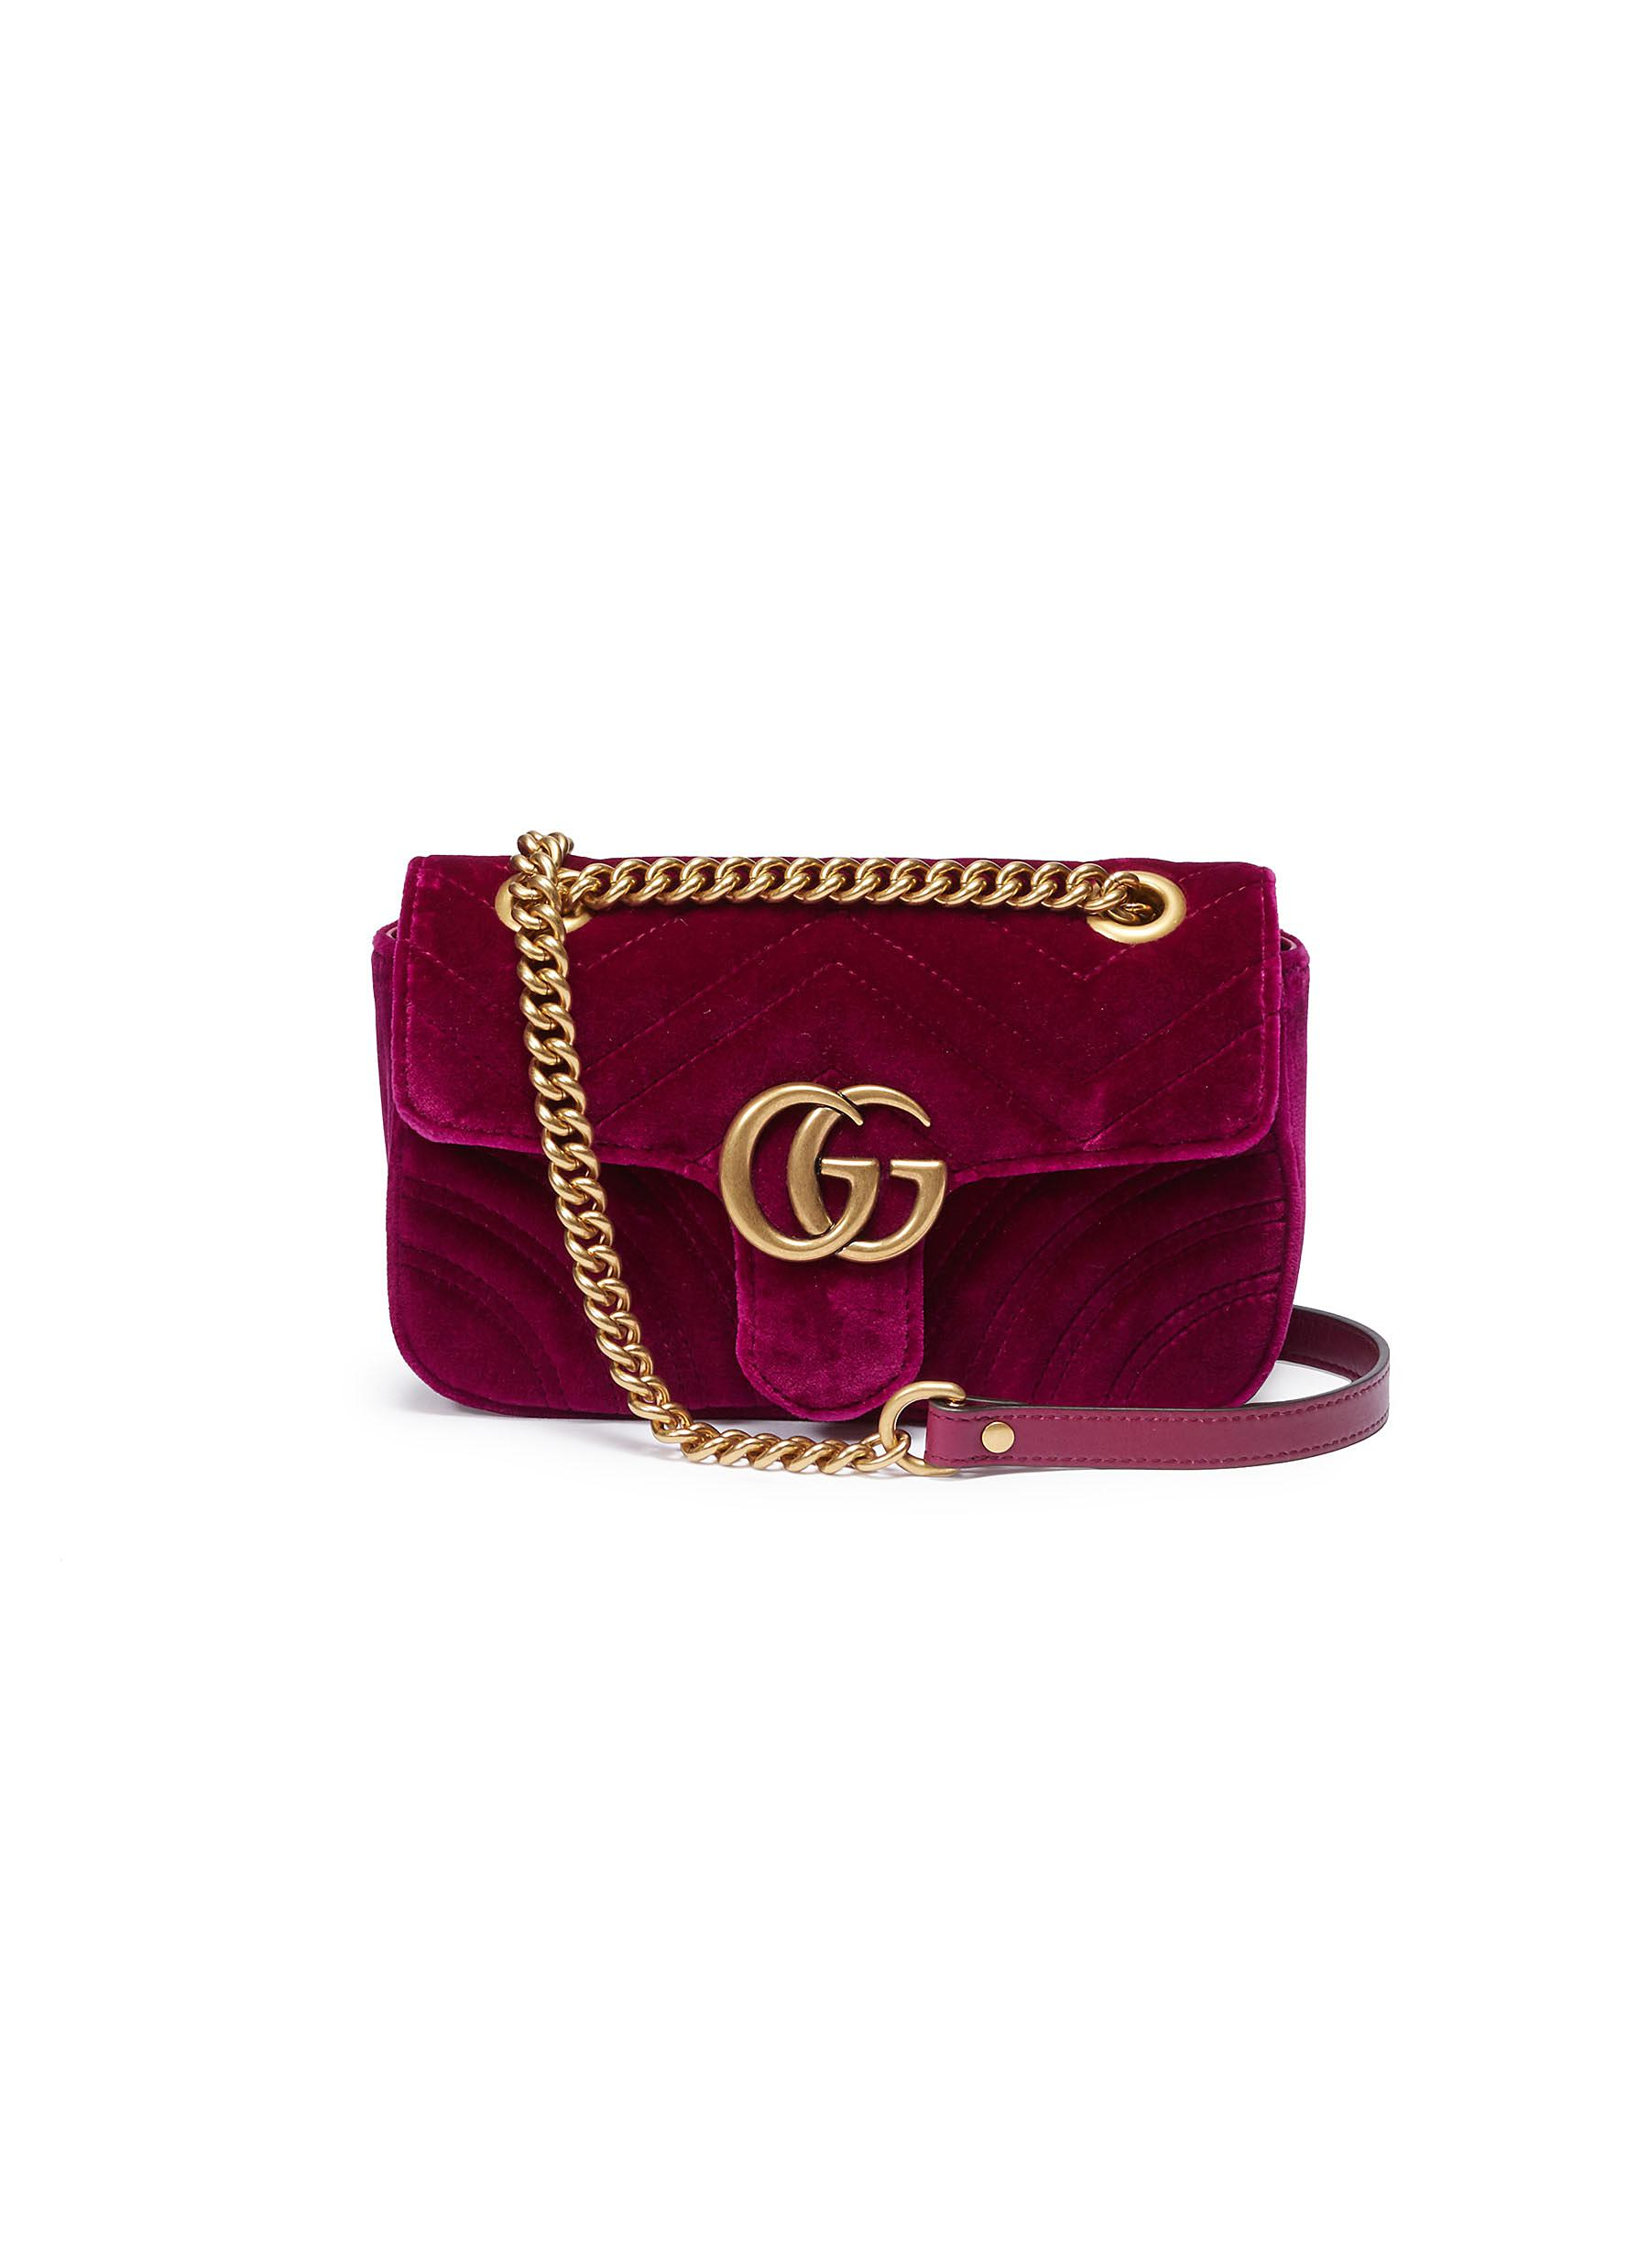 7d200a8e878551 GUCCI | 'GG Marmont' mini quilted velvet crossbody bag | Women ...